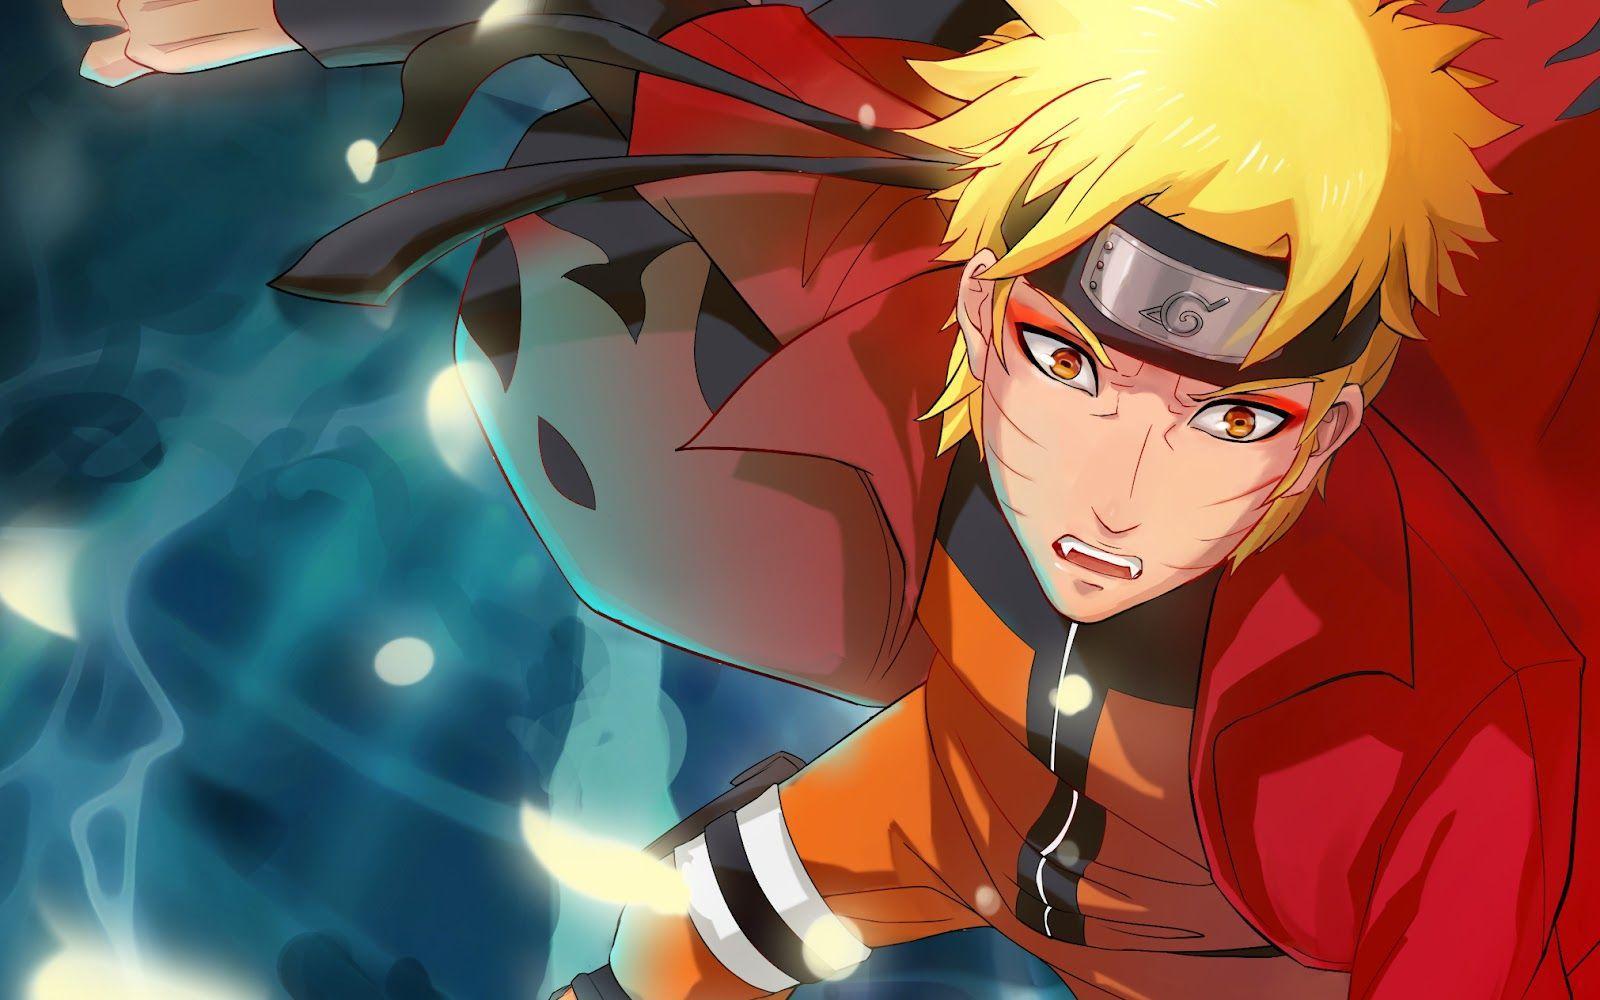 Anime Naruto Shippuden Wallpapers - Top Free Anime Naruto